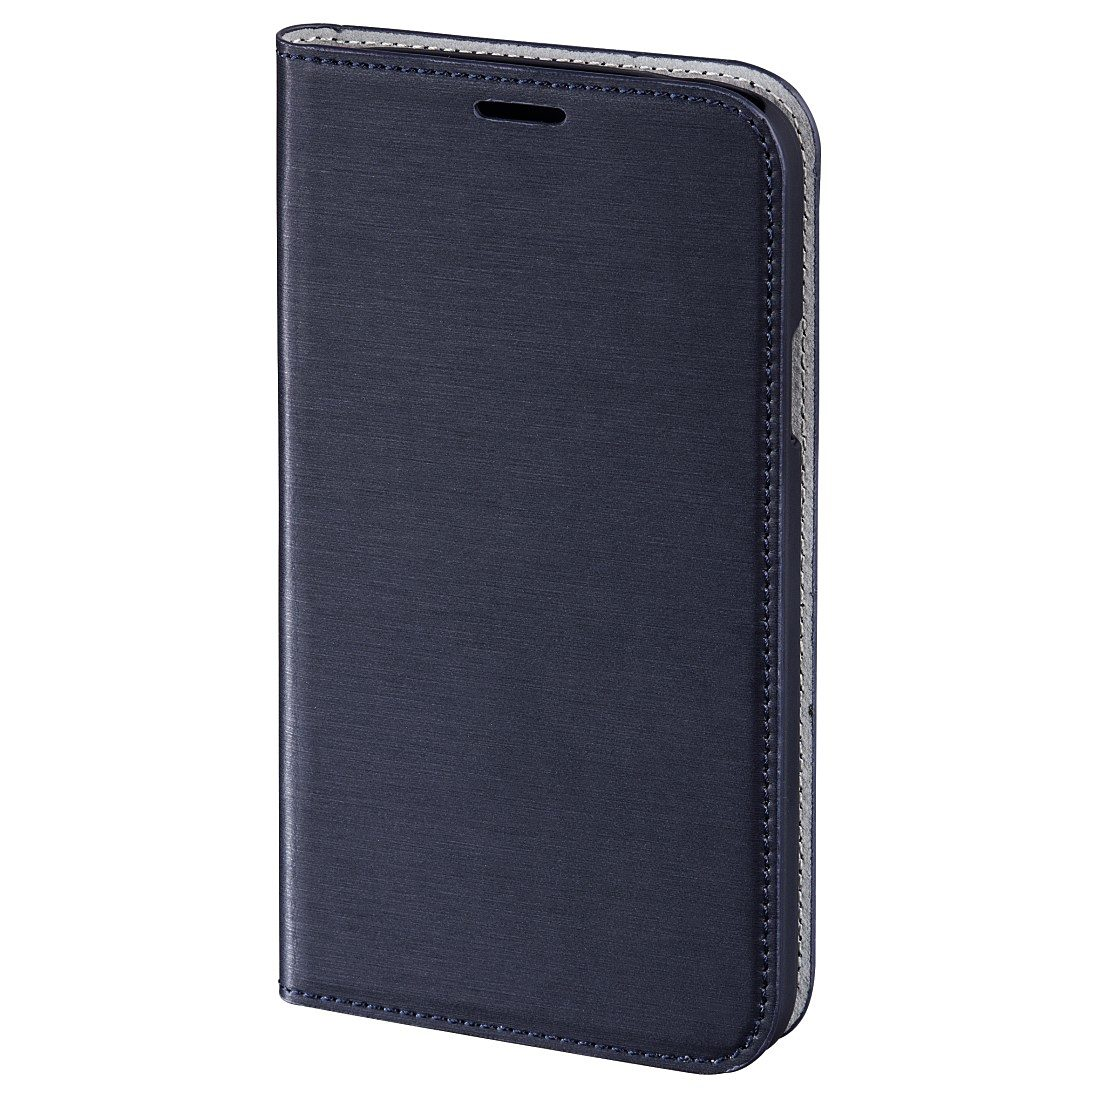 Hama Booklet Slim für Samsung Galaxy S5 mini, Denim-Blau